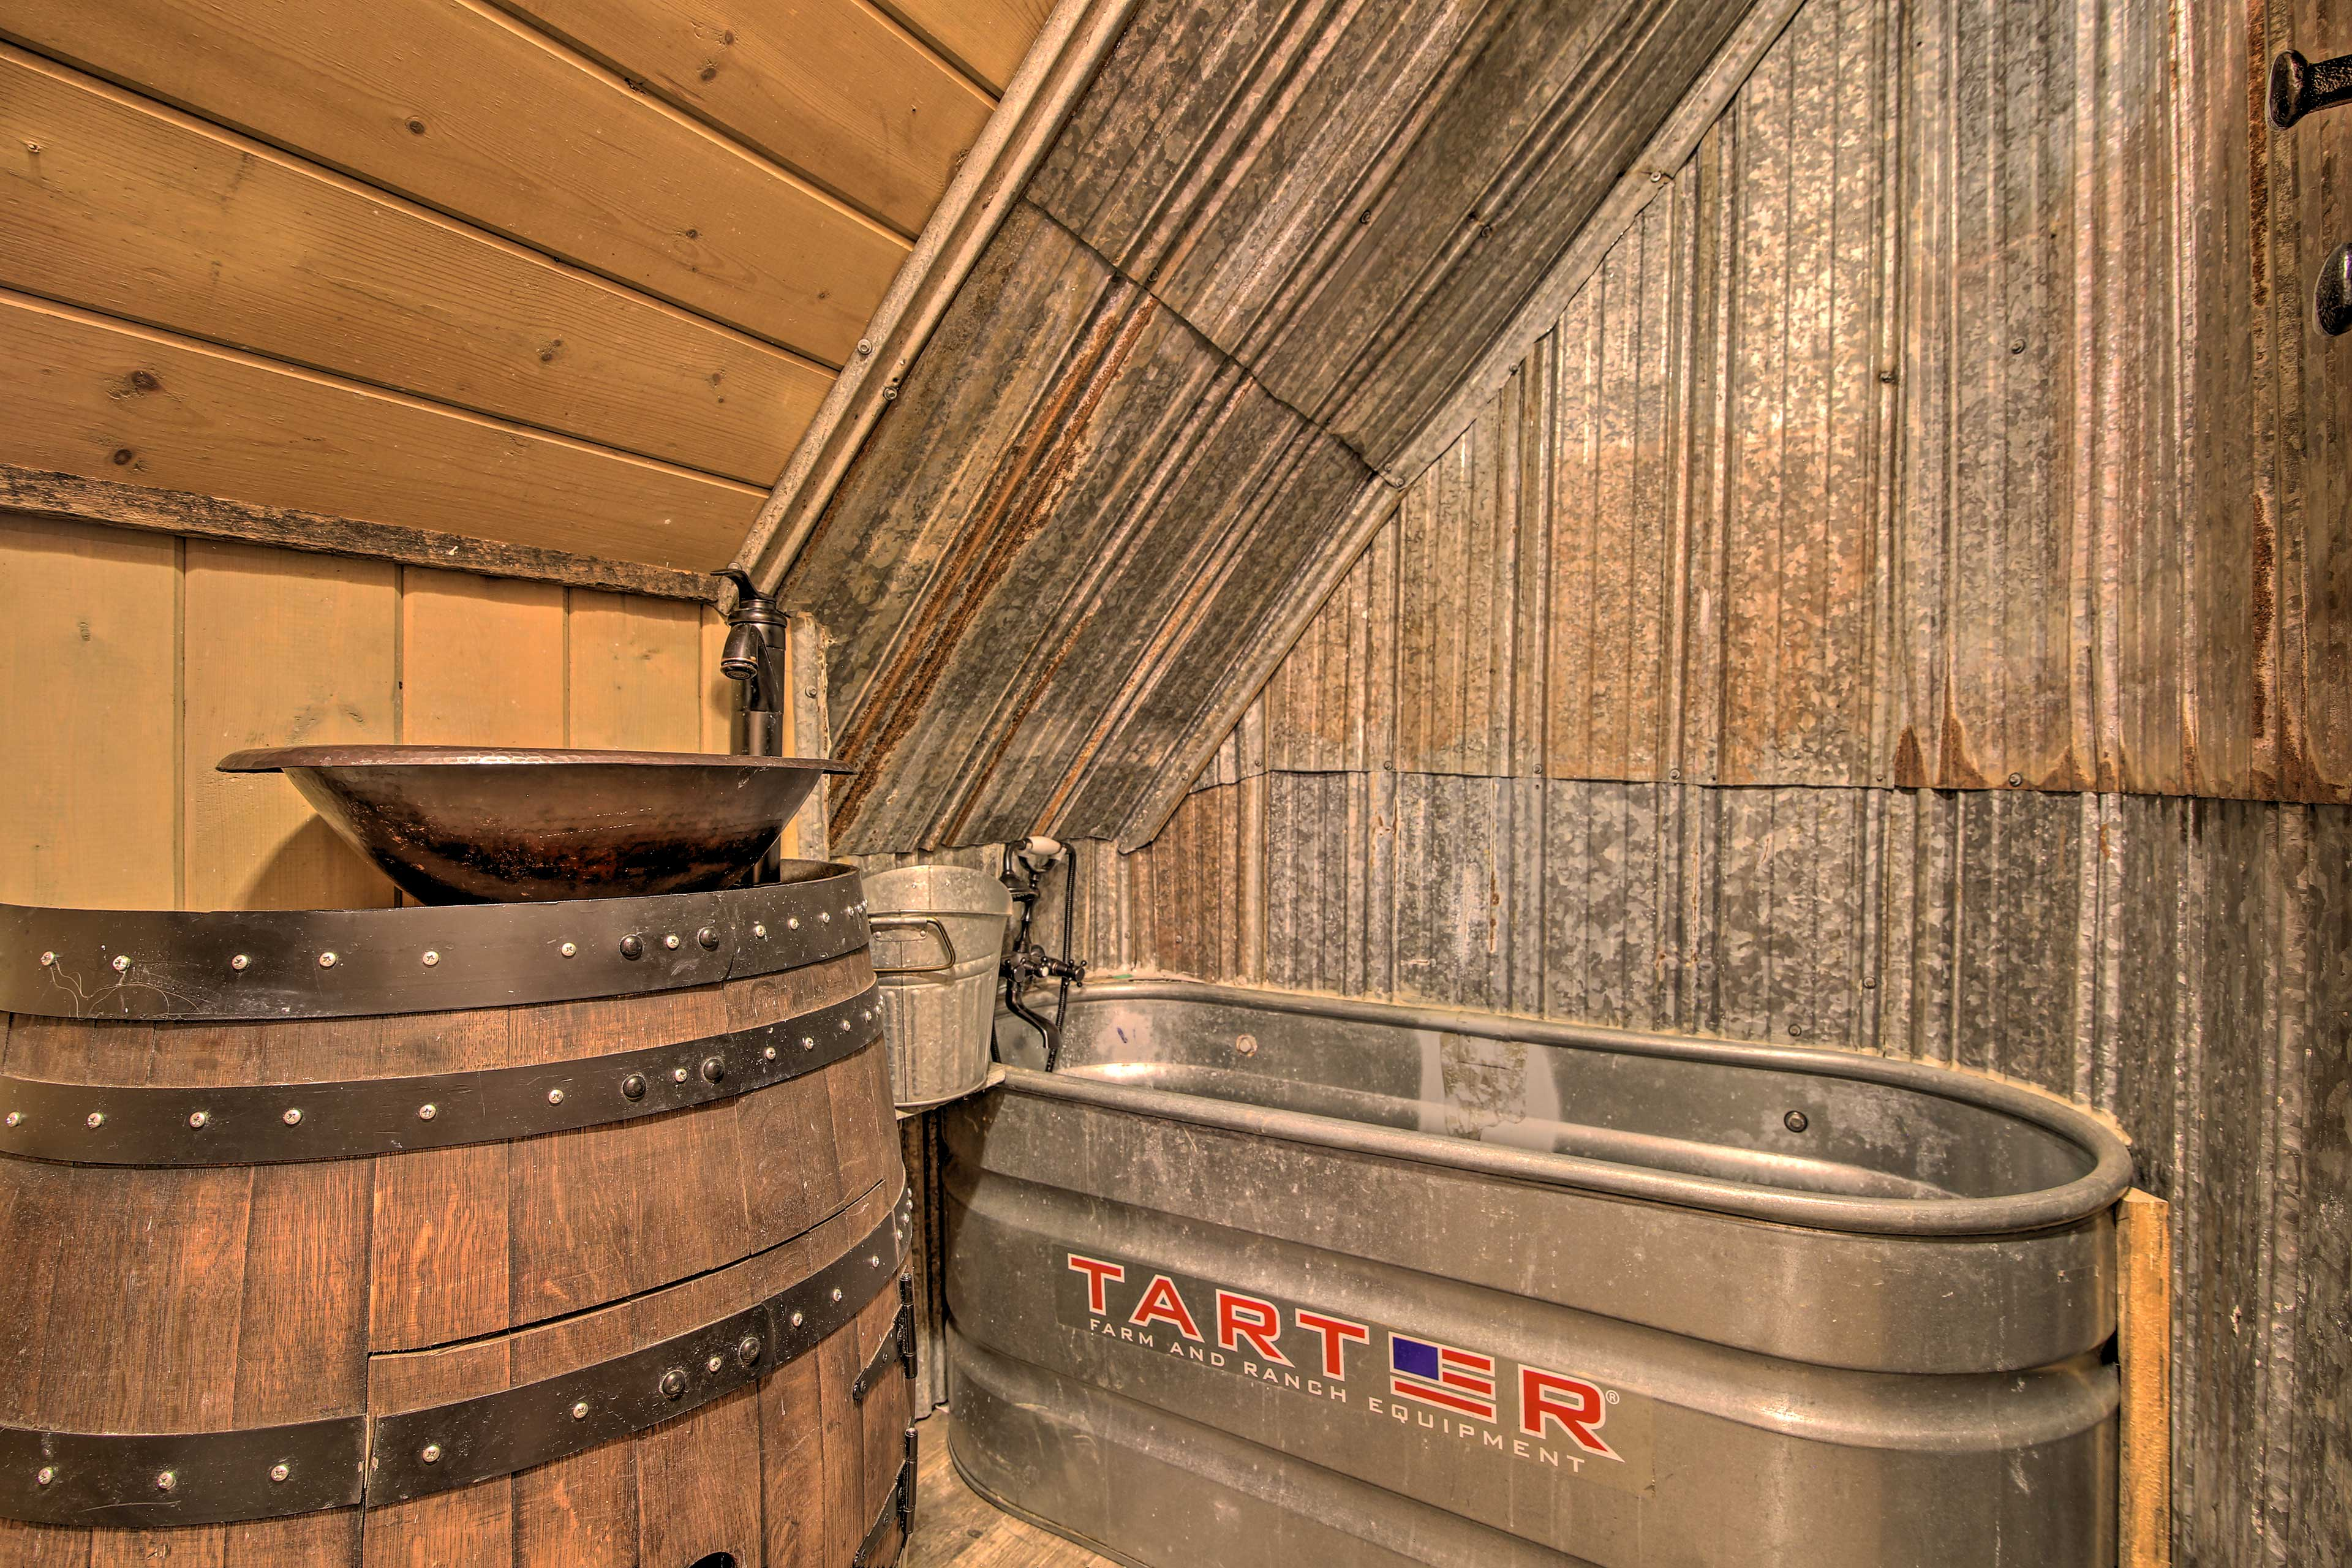 The second bathroom features an authentic, stainless steel farmhouse bathtub.